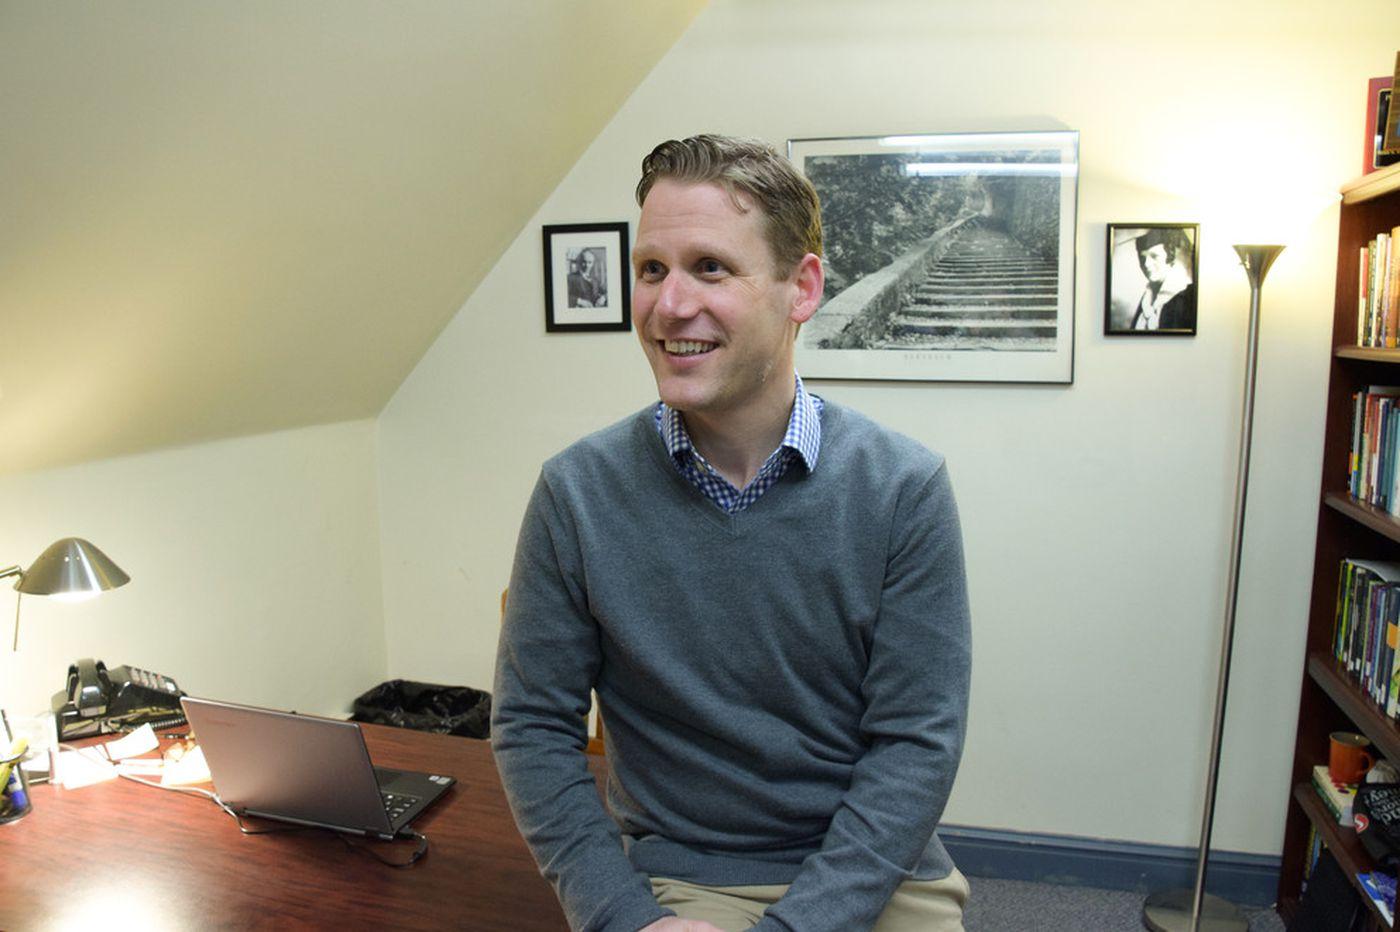 Ross S. Brinkert, associate professor of corporate communication at Penn State Abington, dies at 49